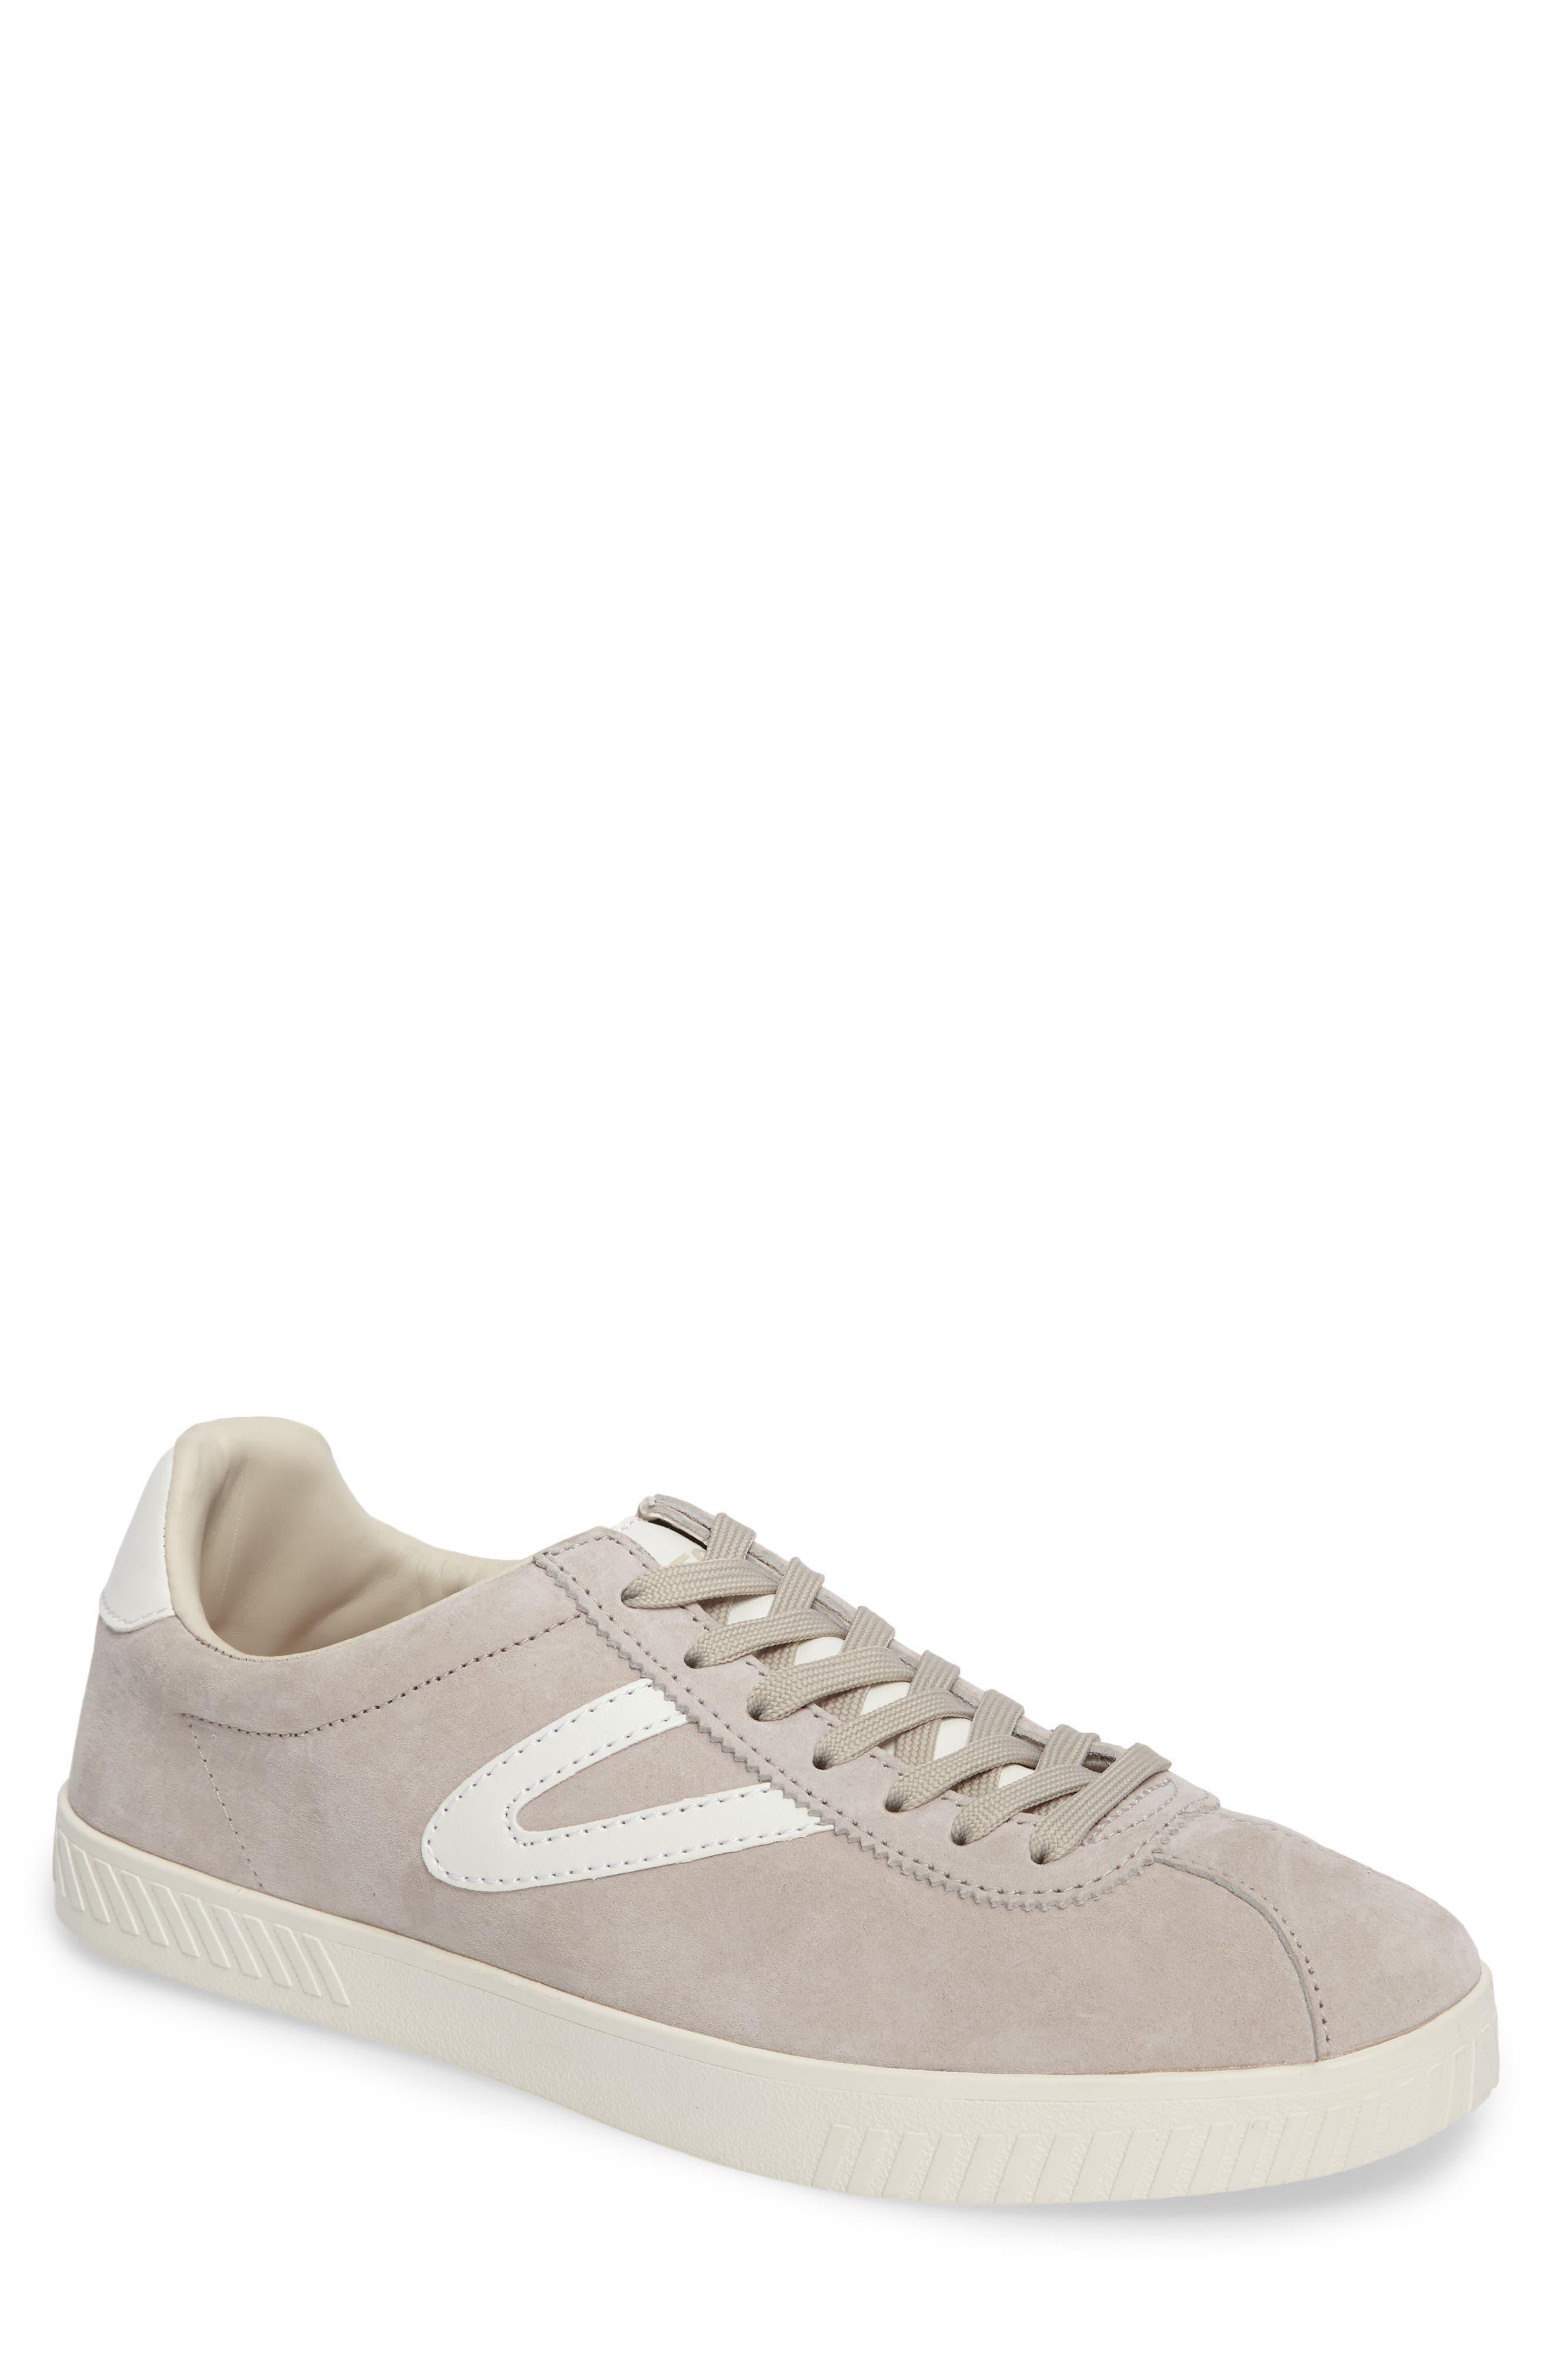 Camden 3 Sneaker,                             Main thumbnail 1, color,                             Birch/ White Nubuck